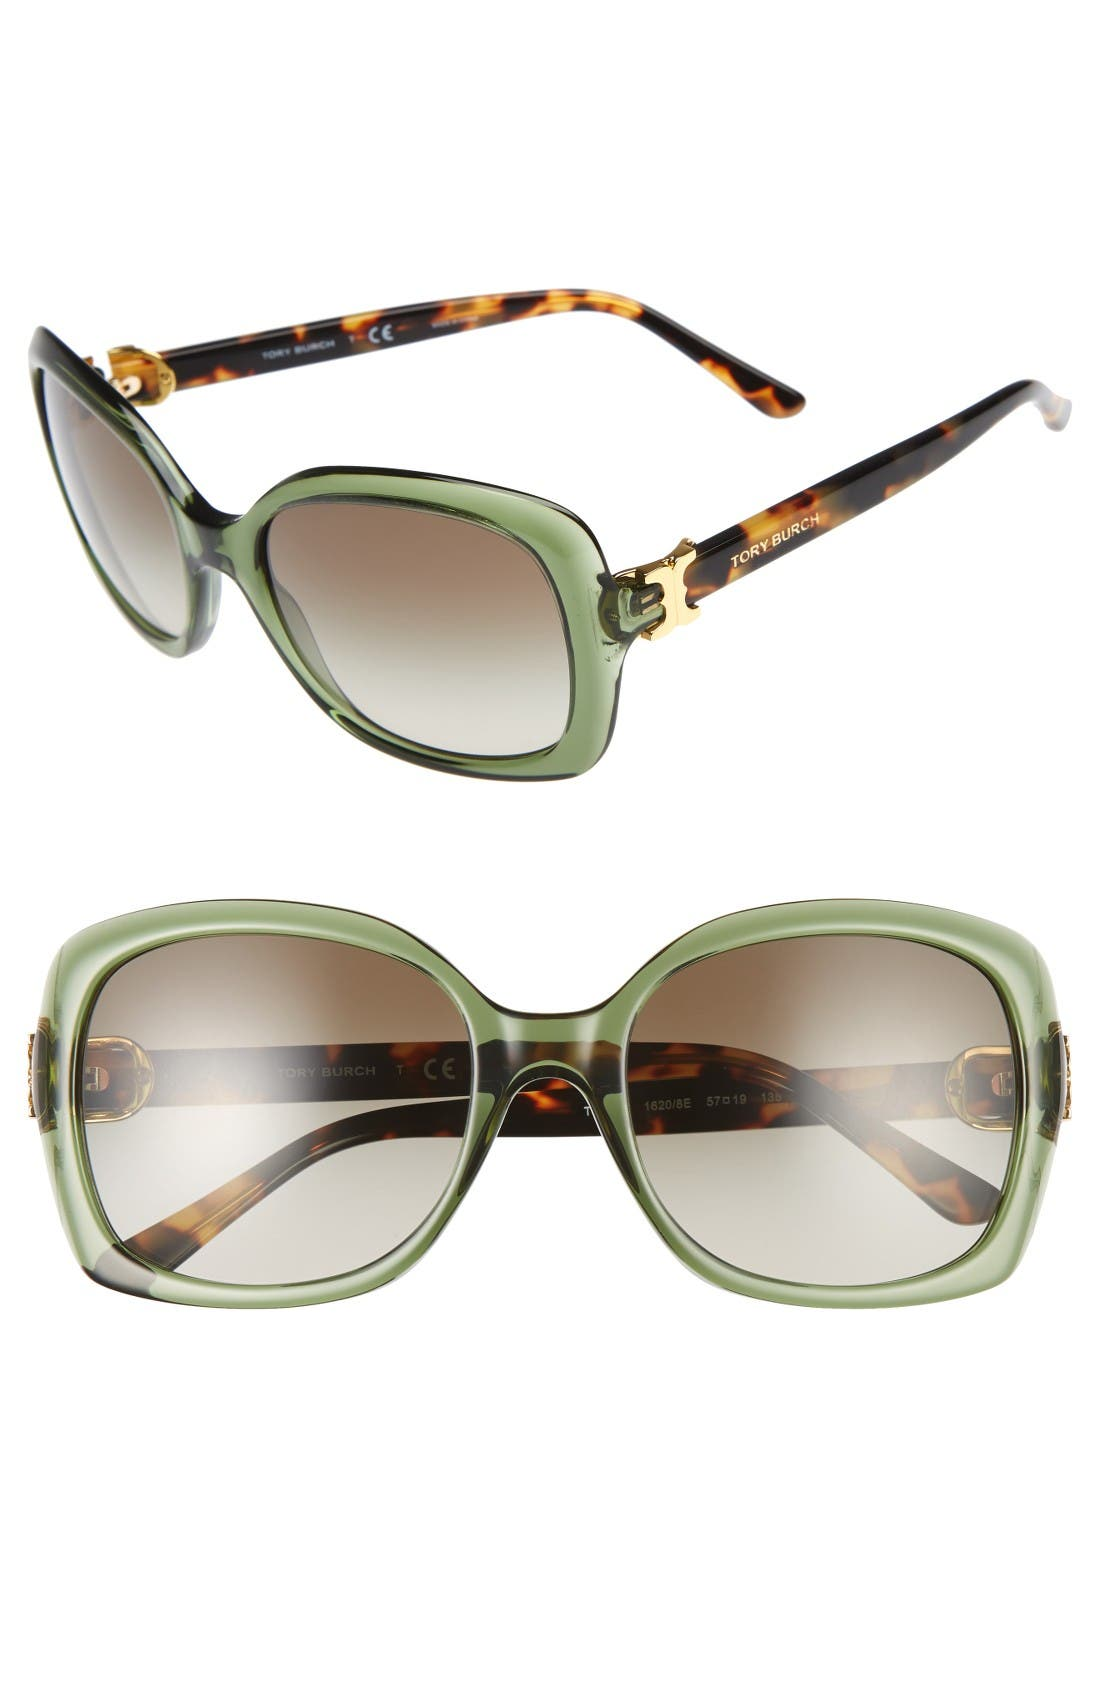 Main Image - Tory Burch 57mm Oversized Sunglasses